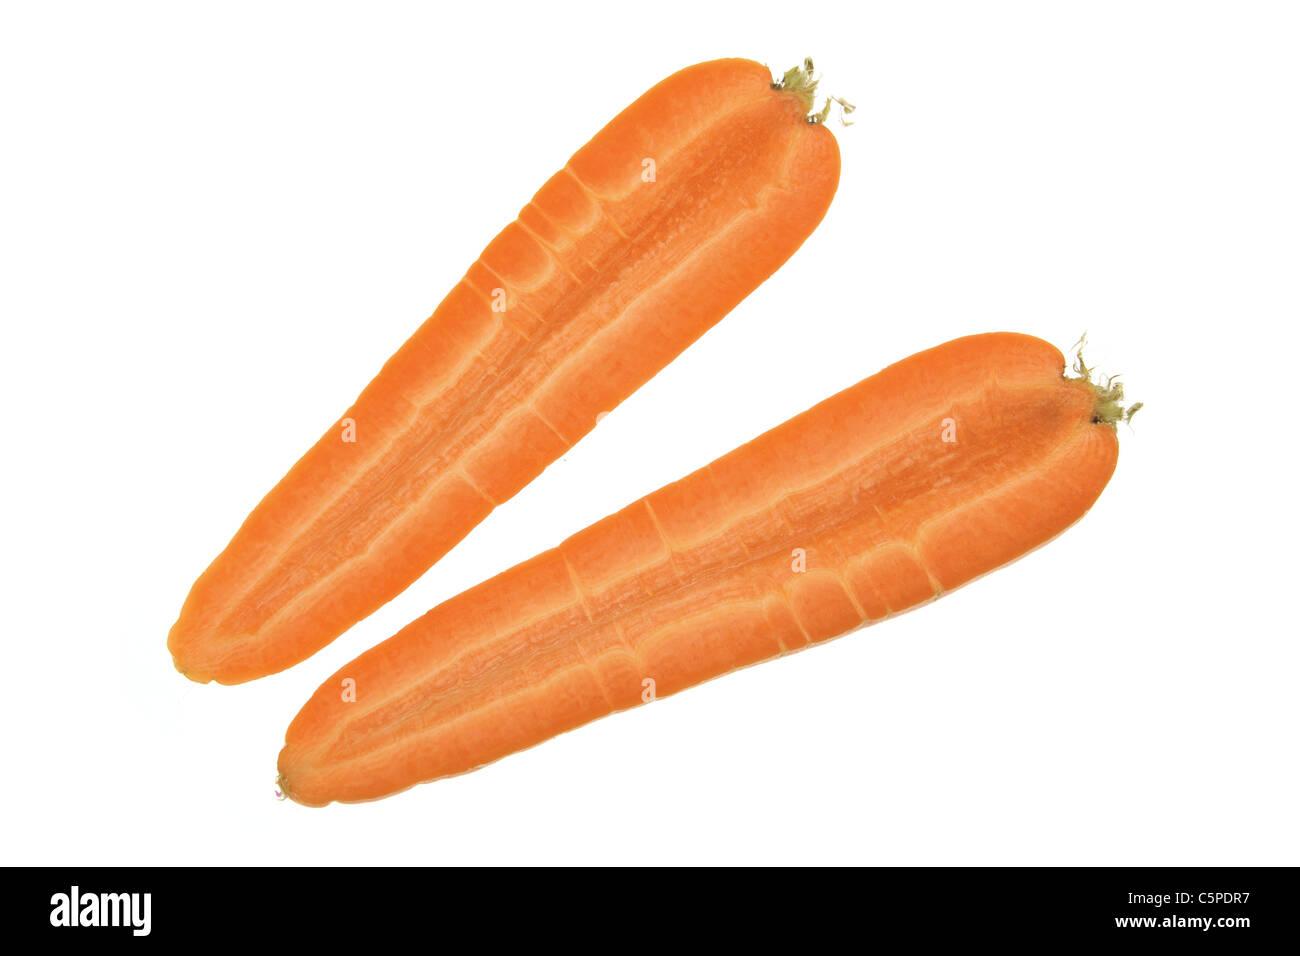 how to easily cut carot